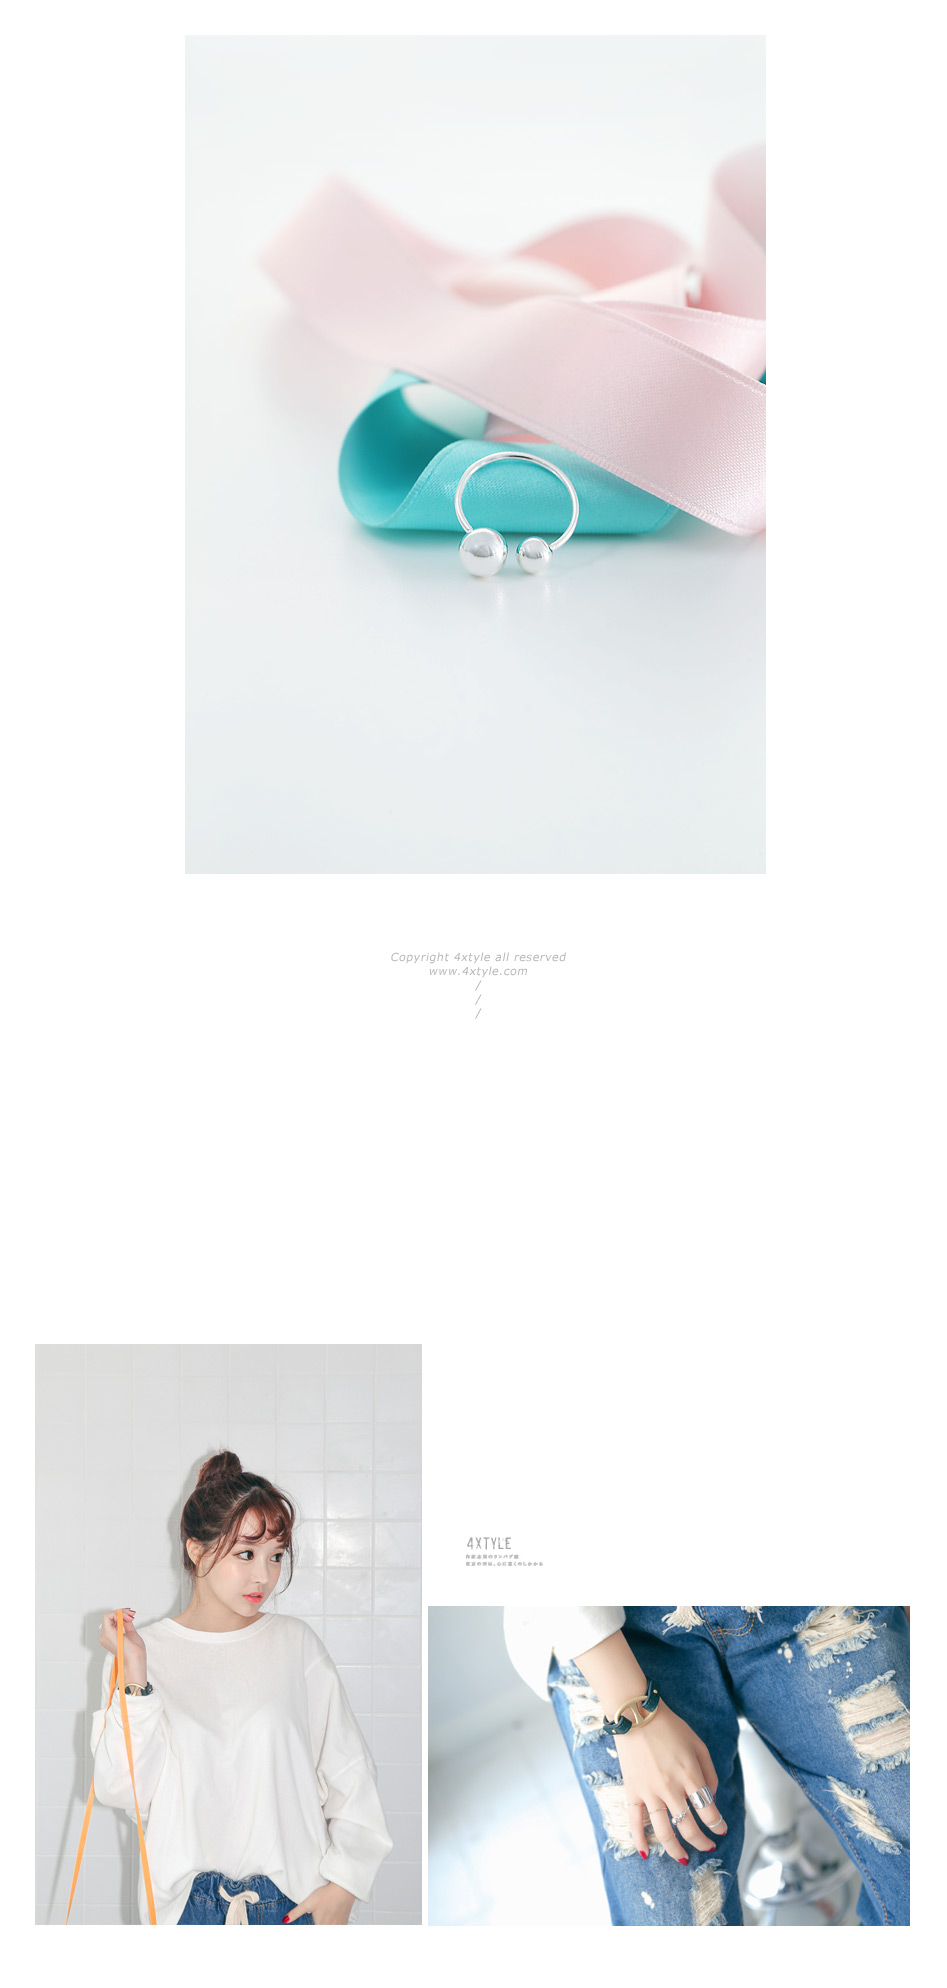 [ 4xtyle ] 塔罗牌的银环,一种颜色